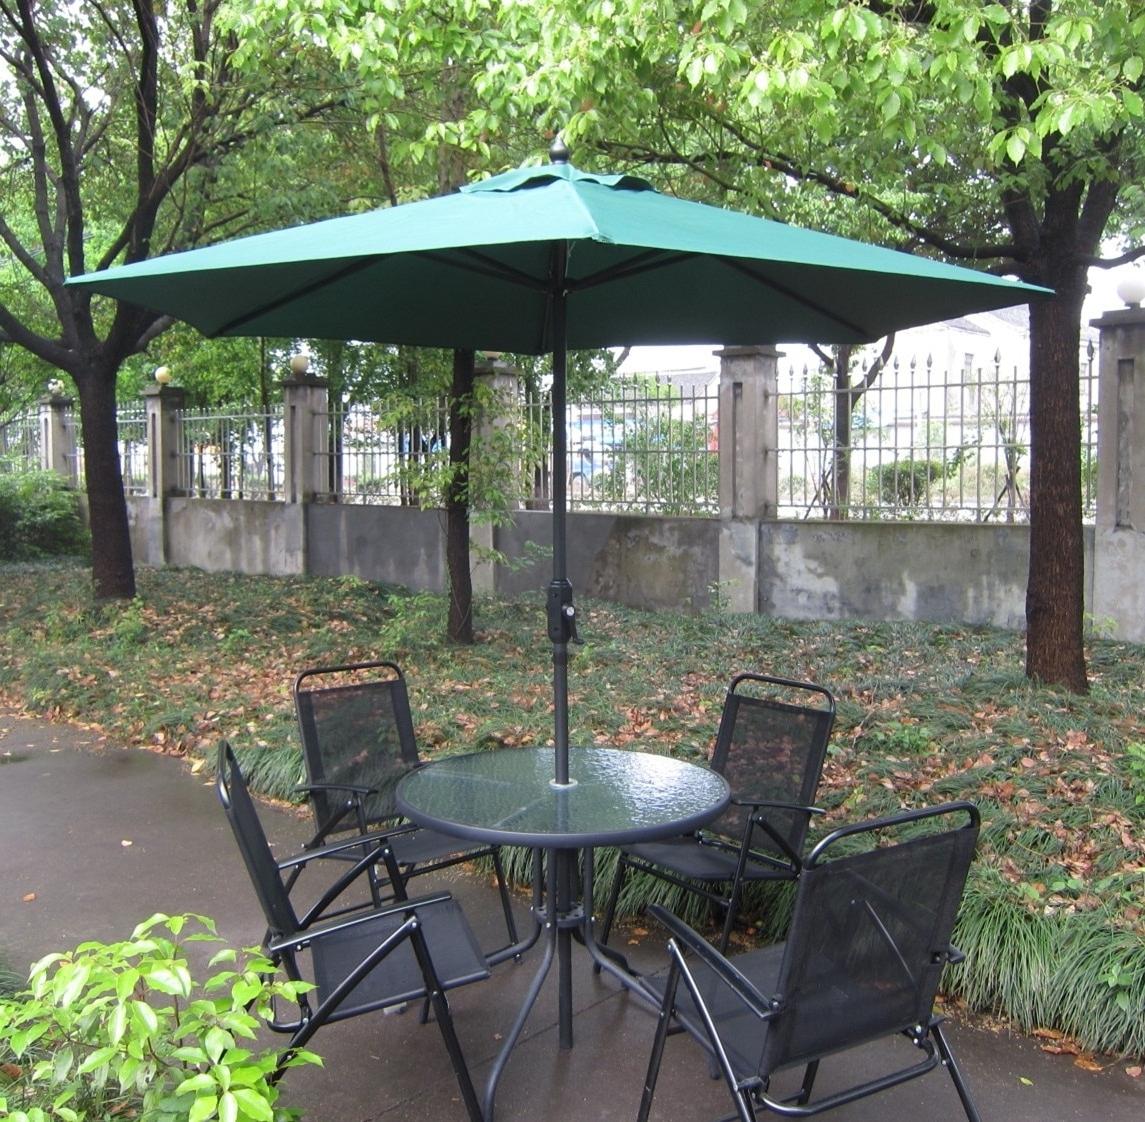 Fashionable European Patio Umbrellas Regarding European Umbrella Outdoor Umbrellas Uv Sun Base Iron Pillar Holder (View 13 of 20)